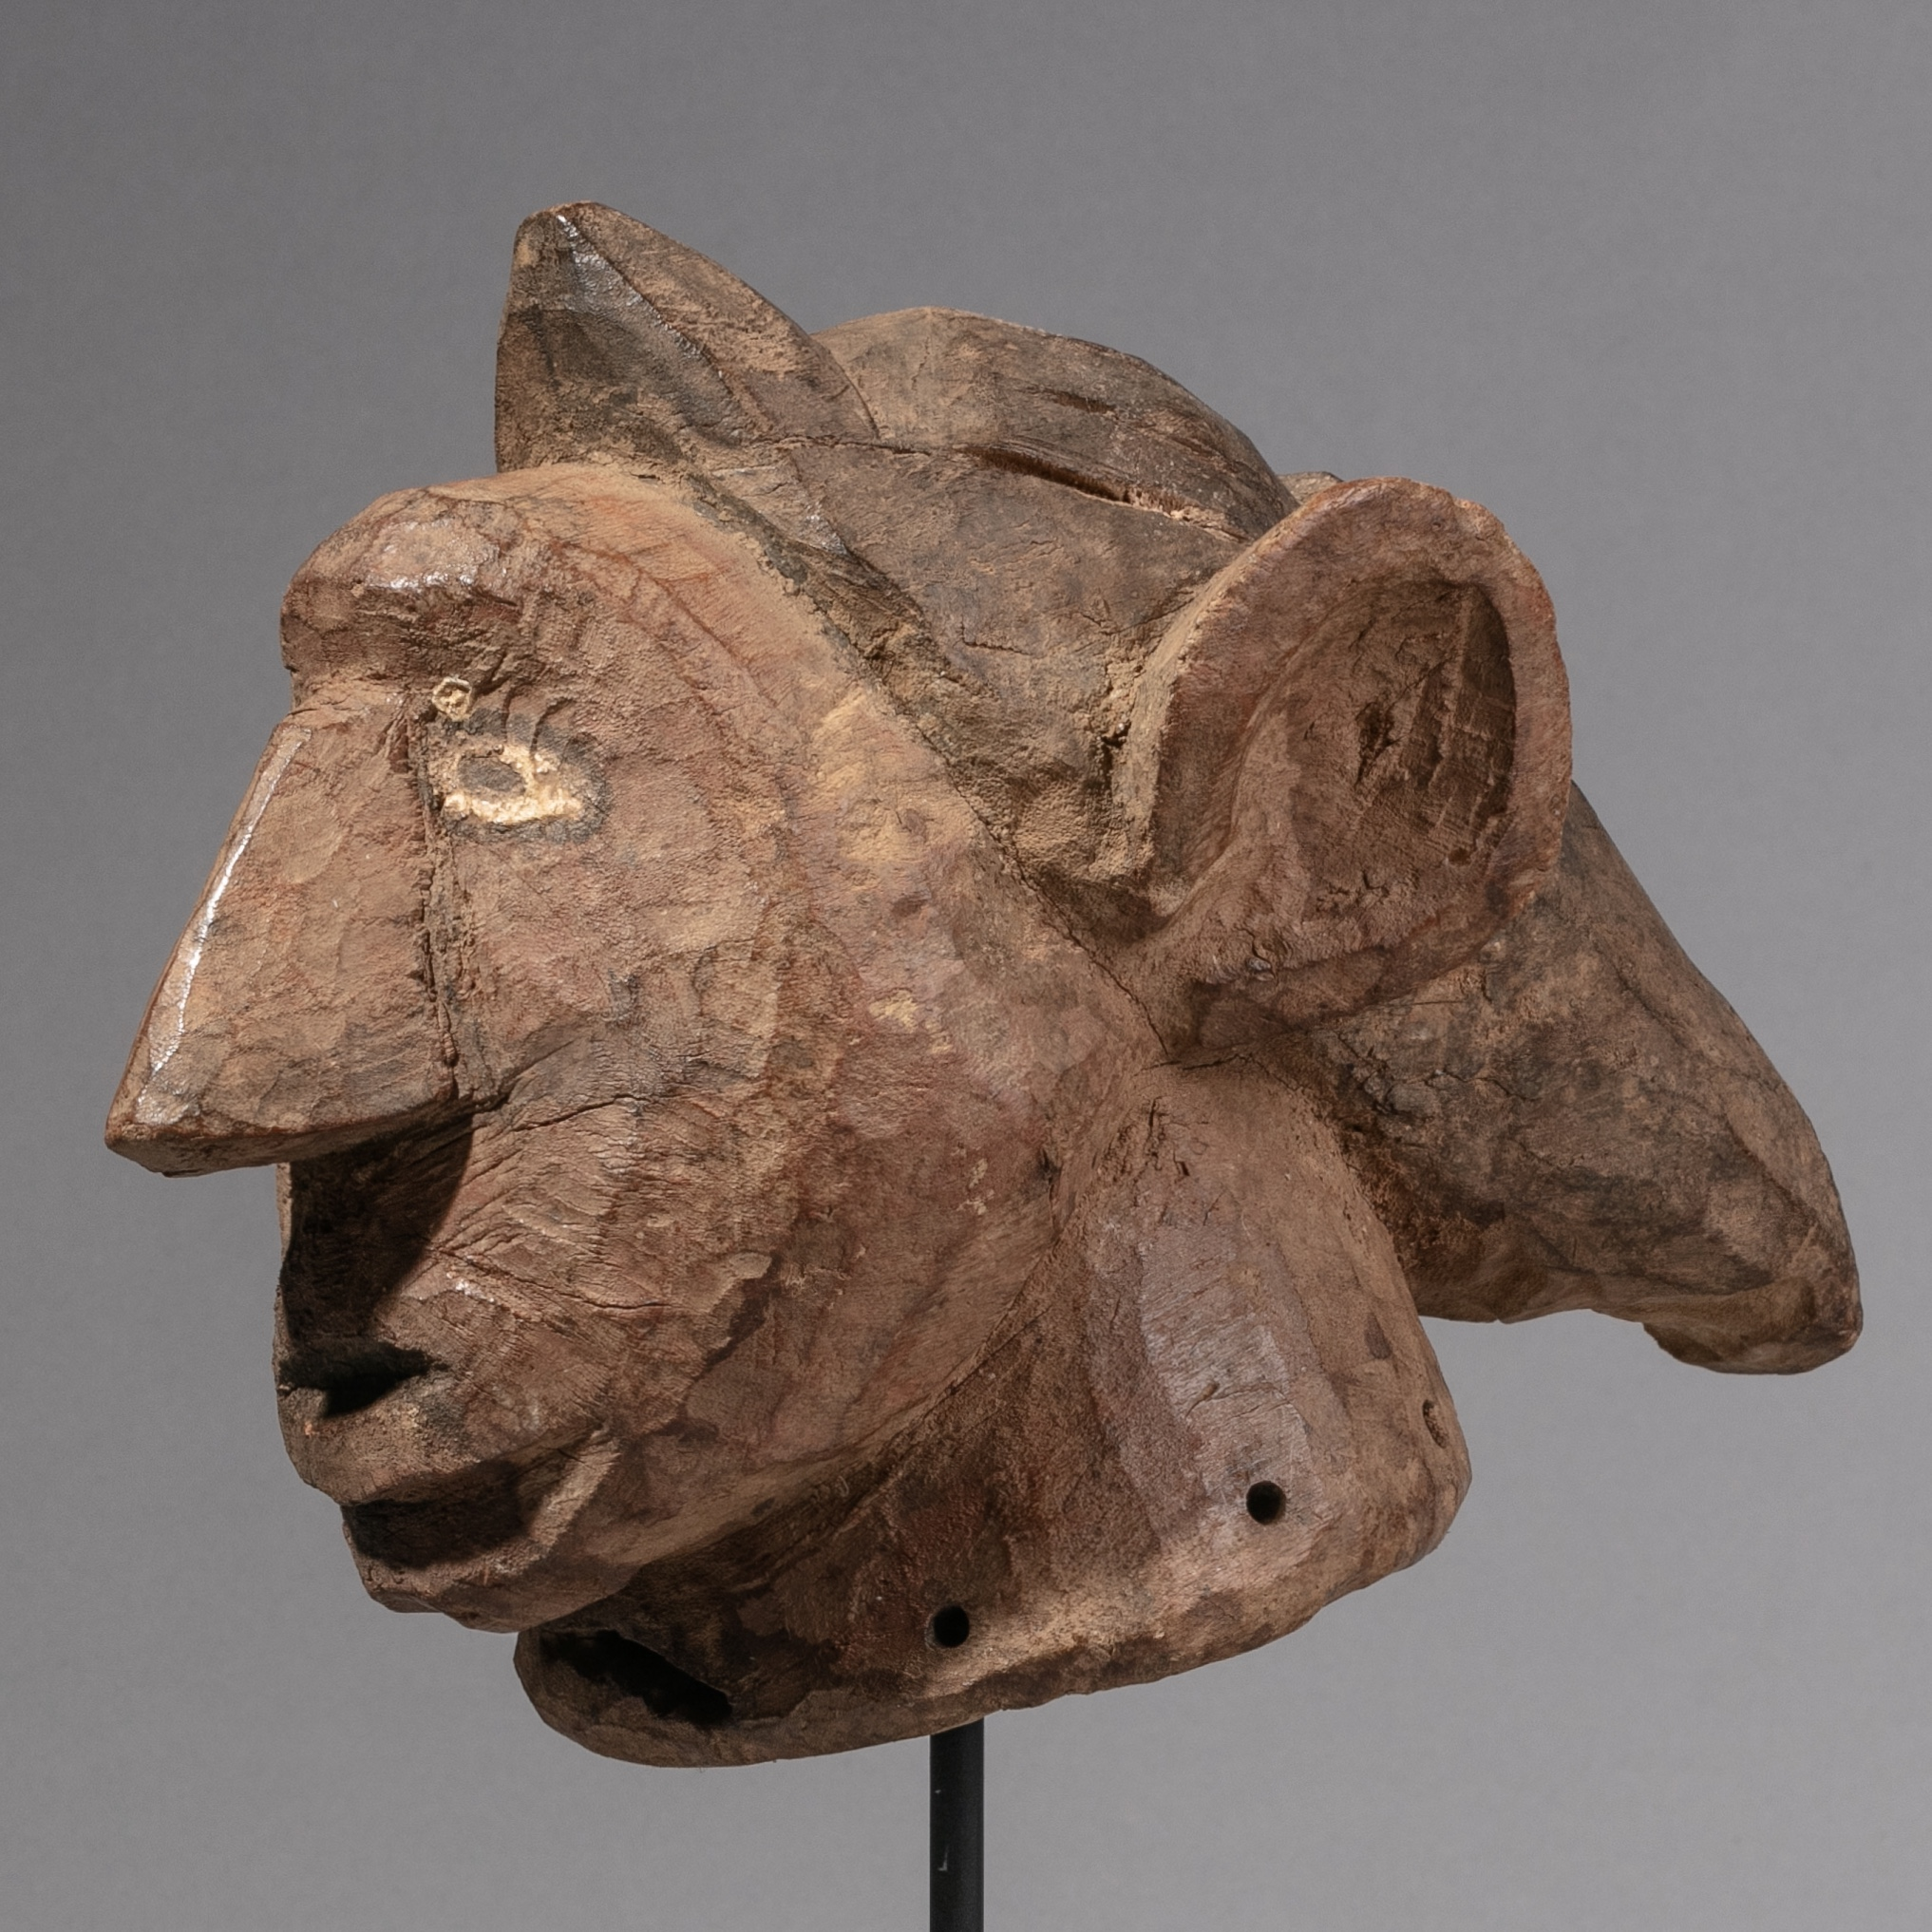 ( SOLD- LY ) -SD AN ELF- LIKE HEADDRESS FROM GURUNSI TRIBE OF BURKINA FASO ( No 1586 )